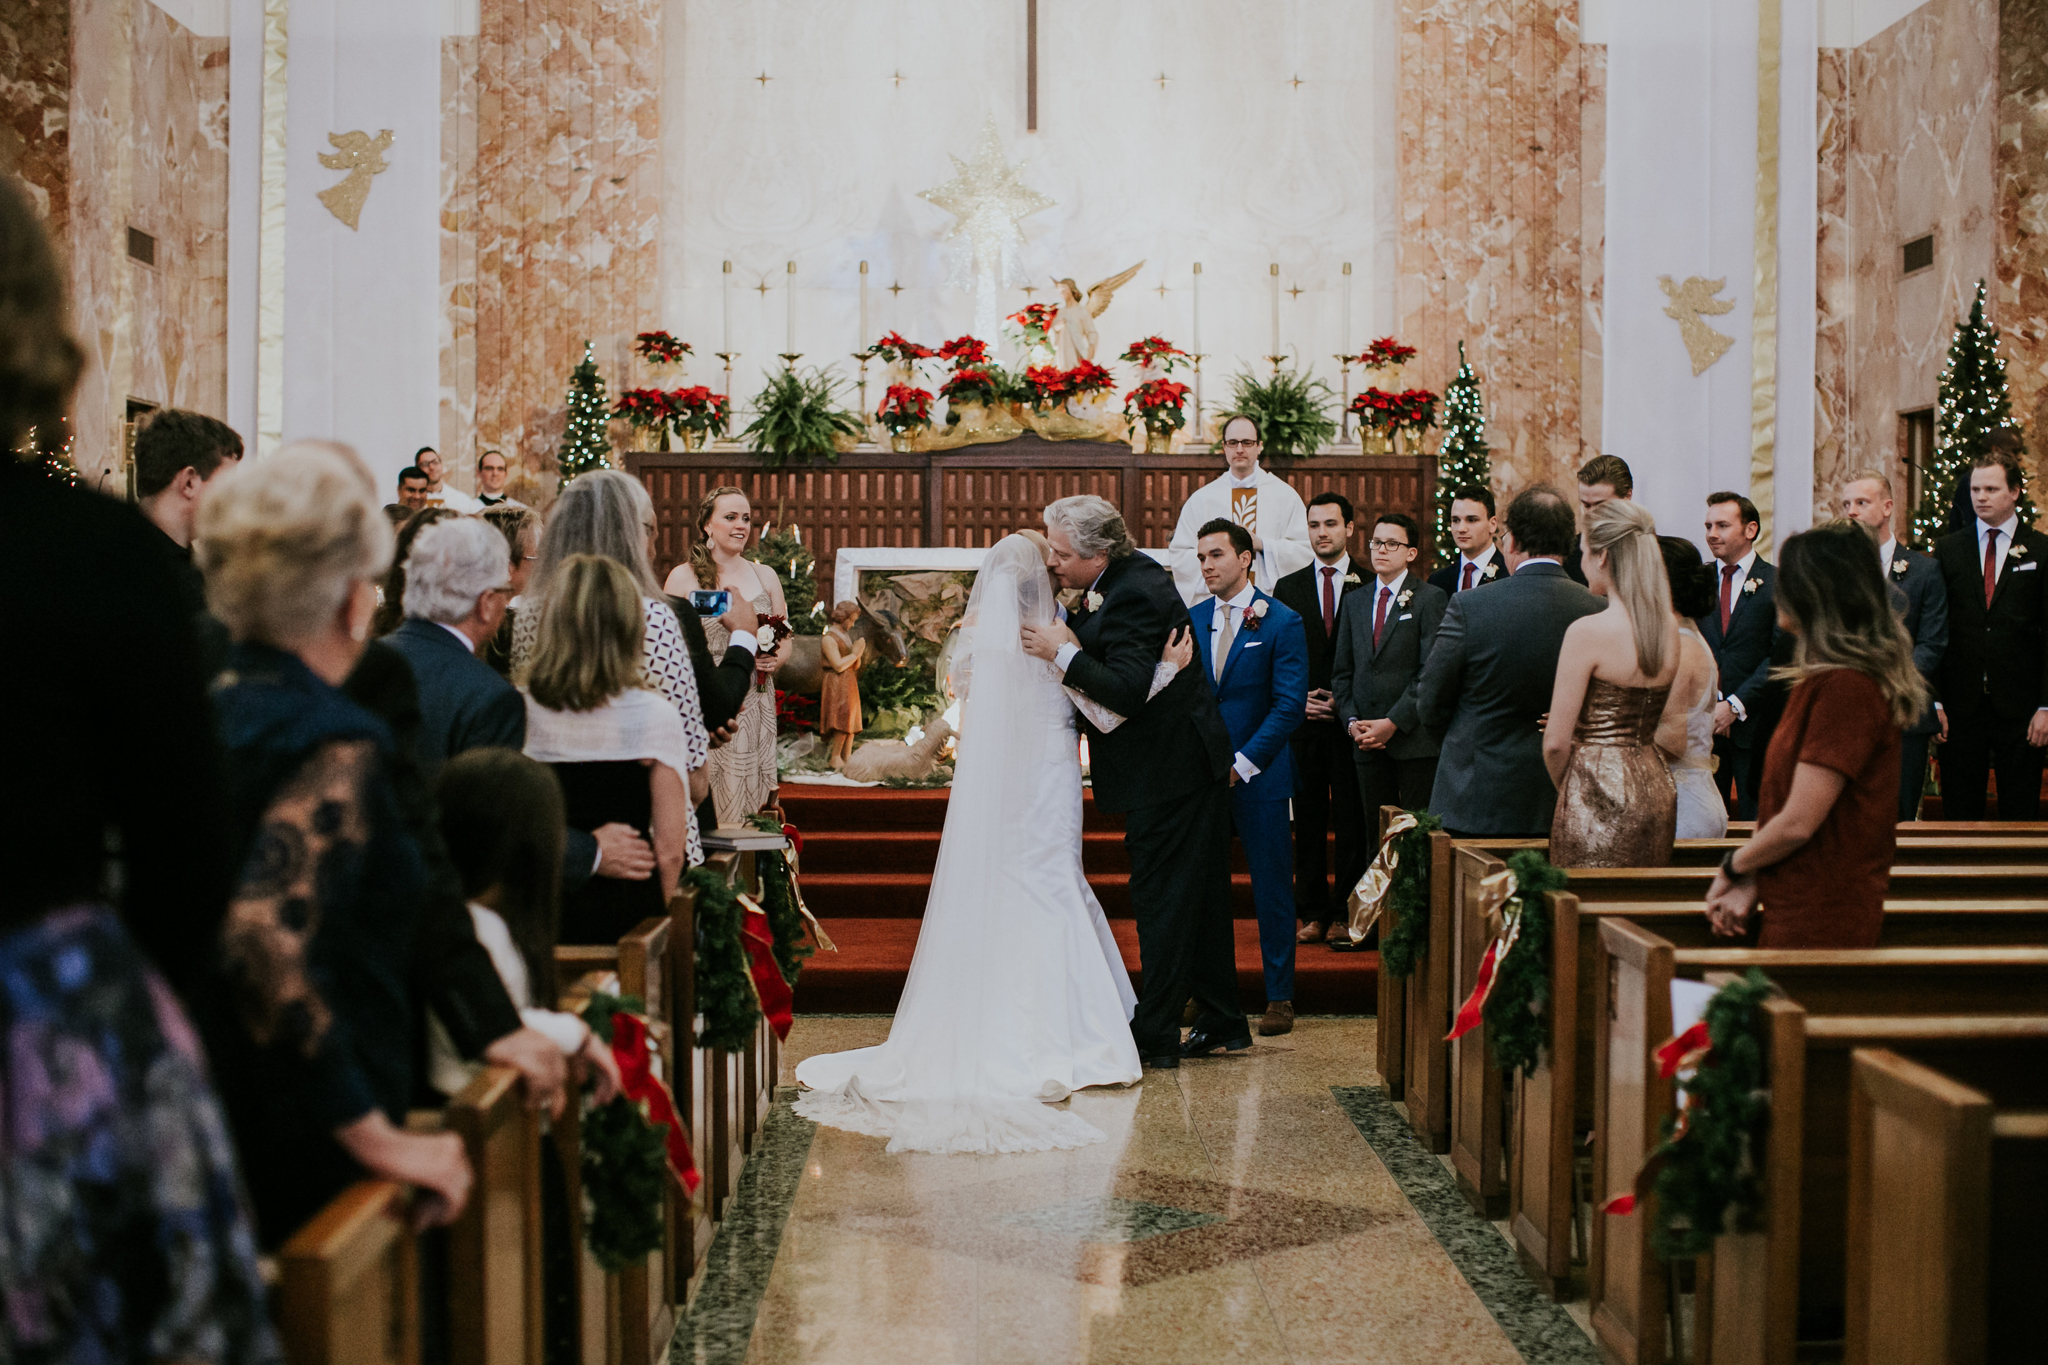 20151230_hussem_wedding_0388_web.jpg